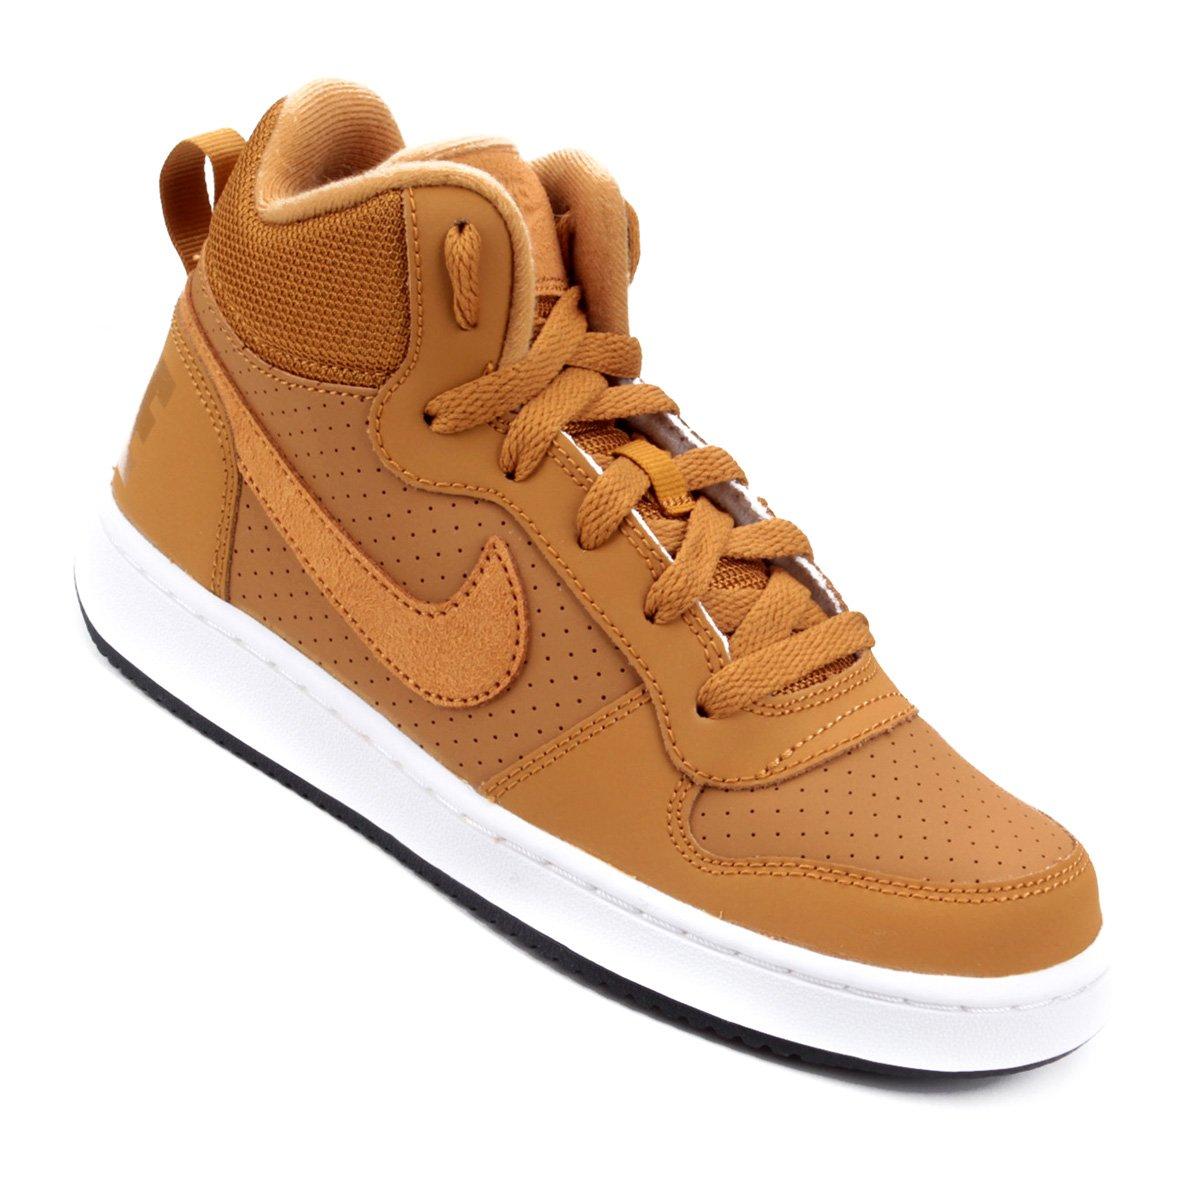 f3e382ee8b0 Tênis Infantil Nike Court Borough Mid Masculino - Bege - Compre Agora